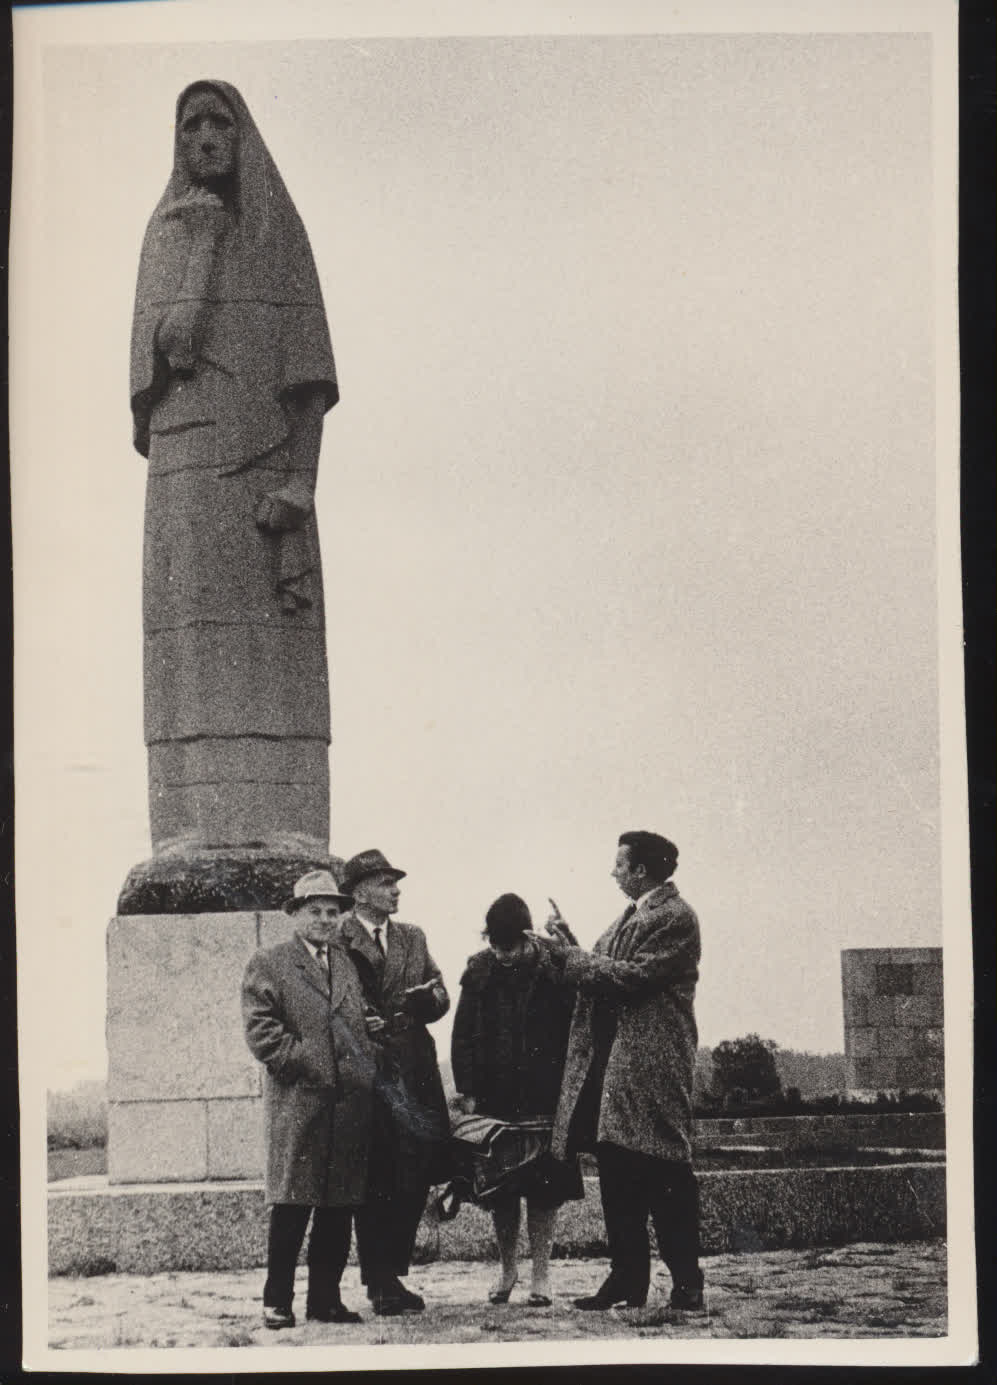 J. Lapašinskas, J. Baltušis, J. Vaičiūnaitė, V. Reimeris Pirčiupiuose.  1962 m.